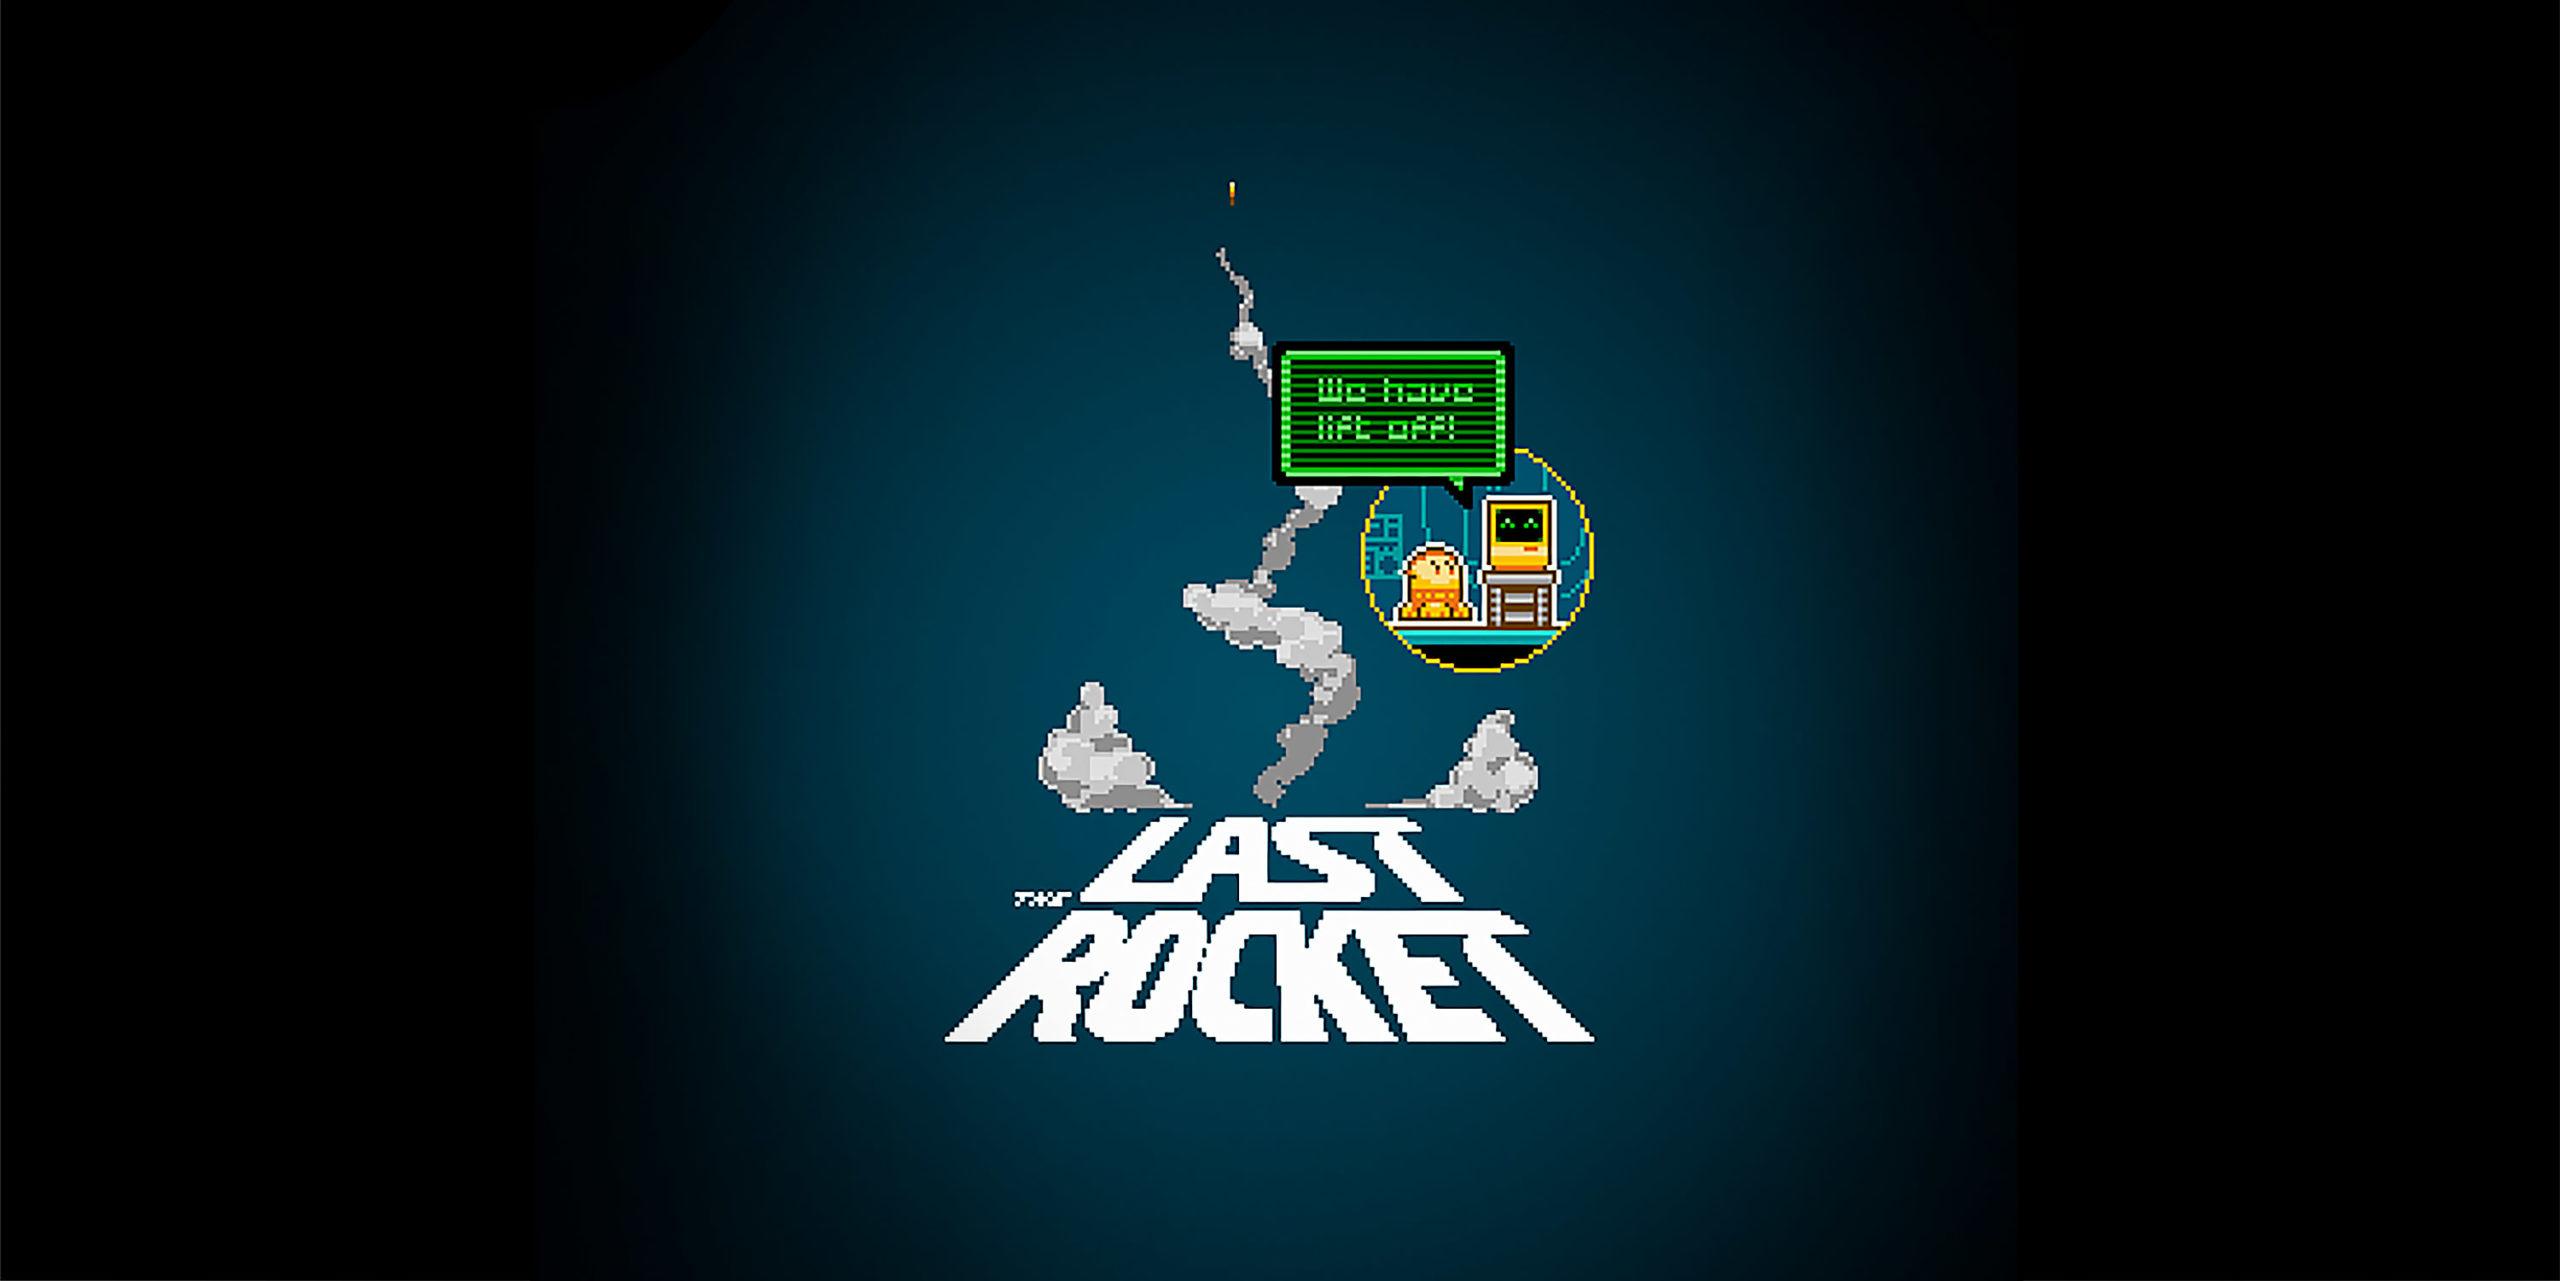 The Last Rocket 8 bit video game promo